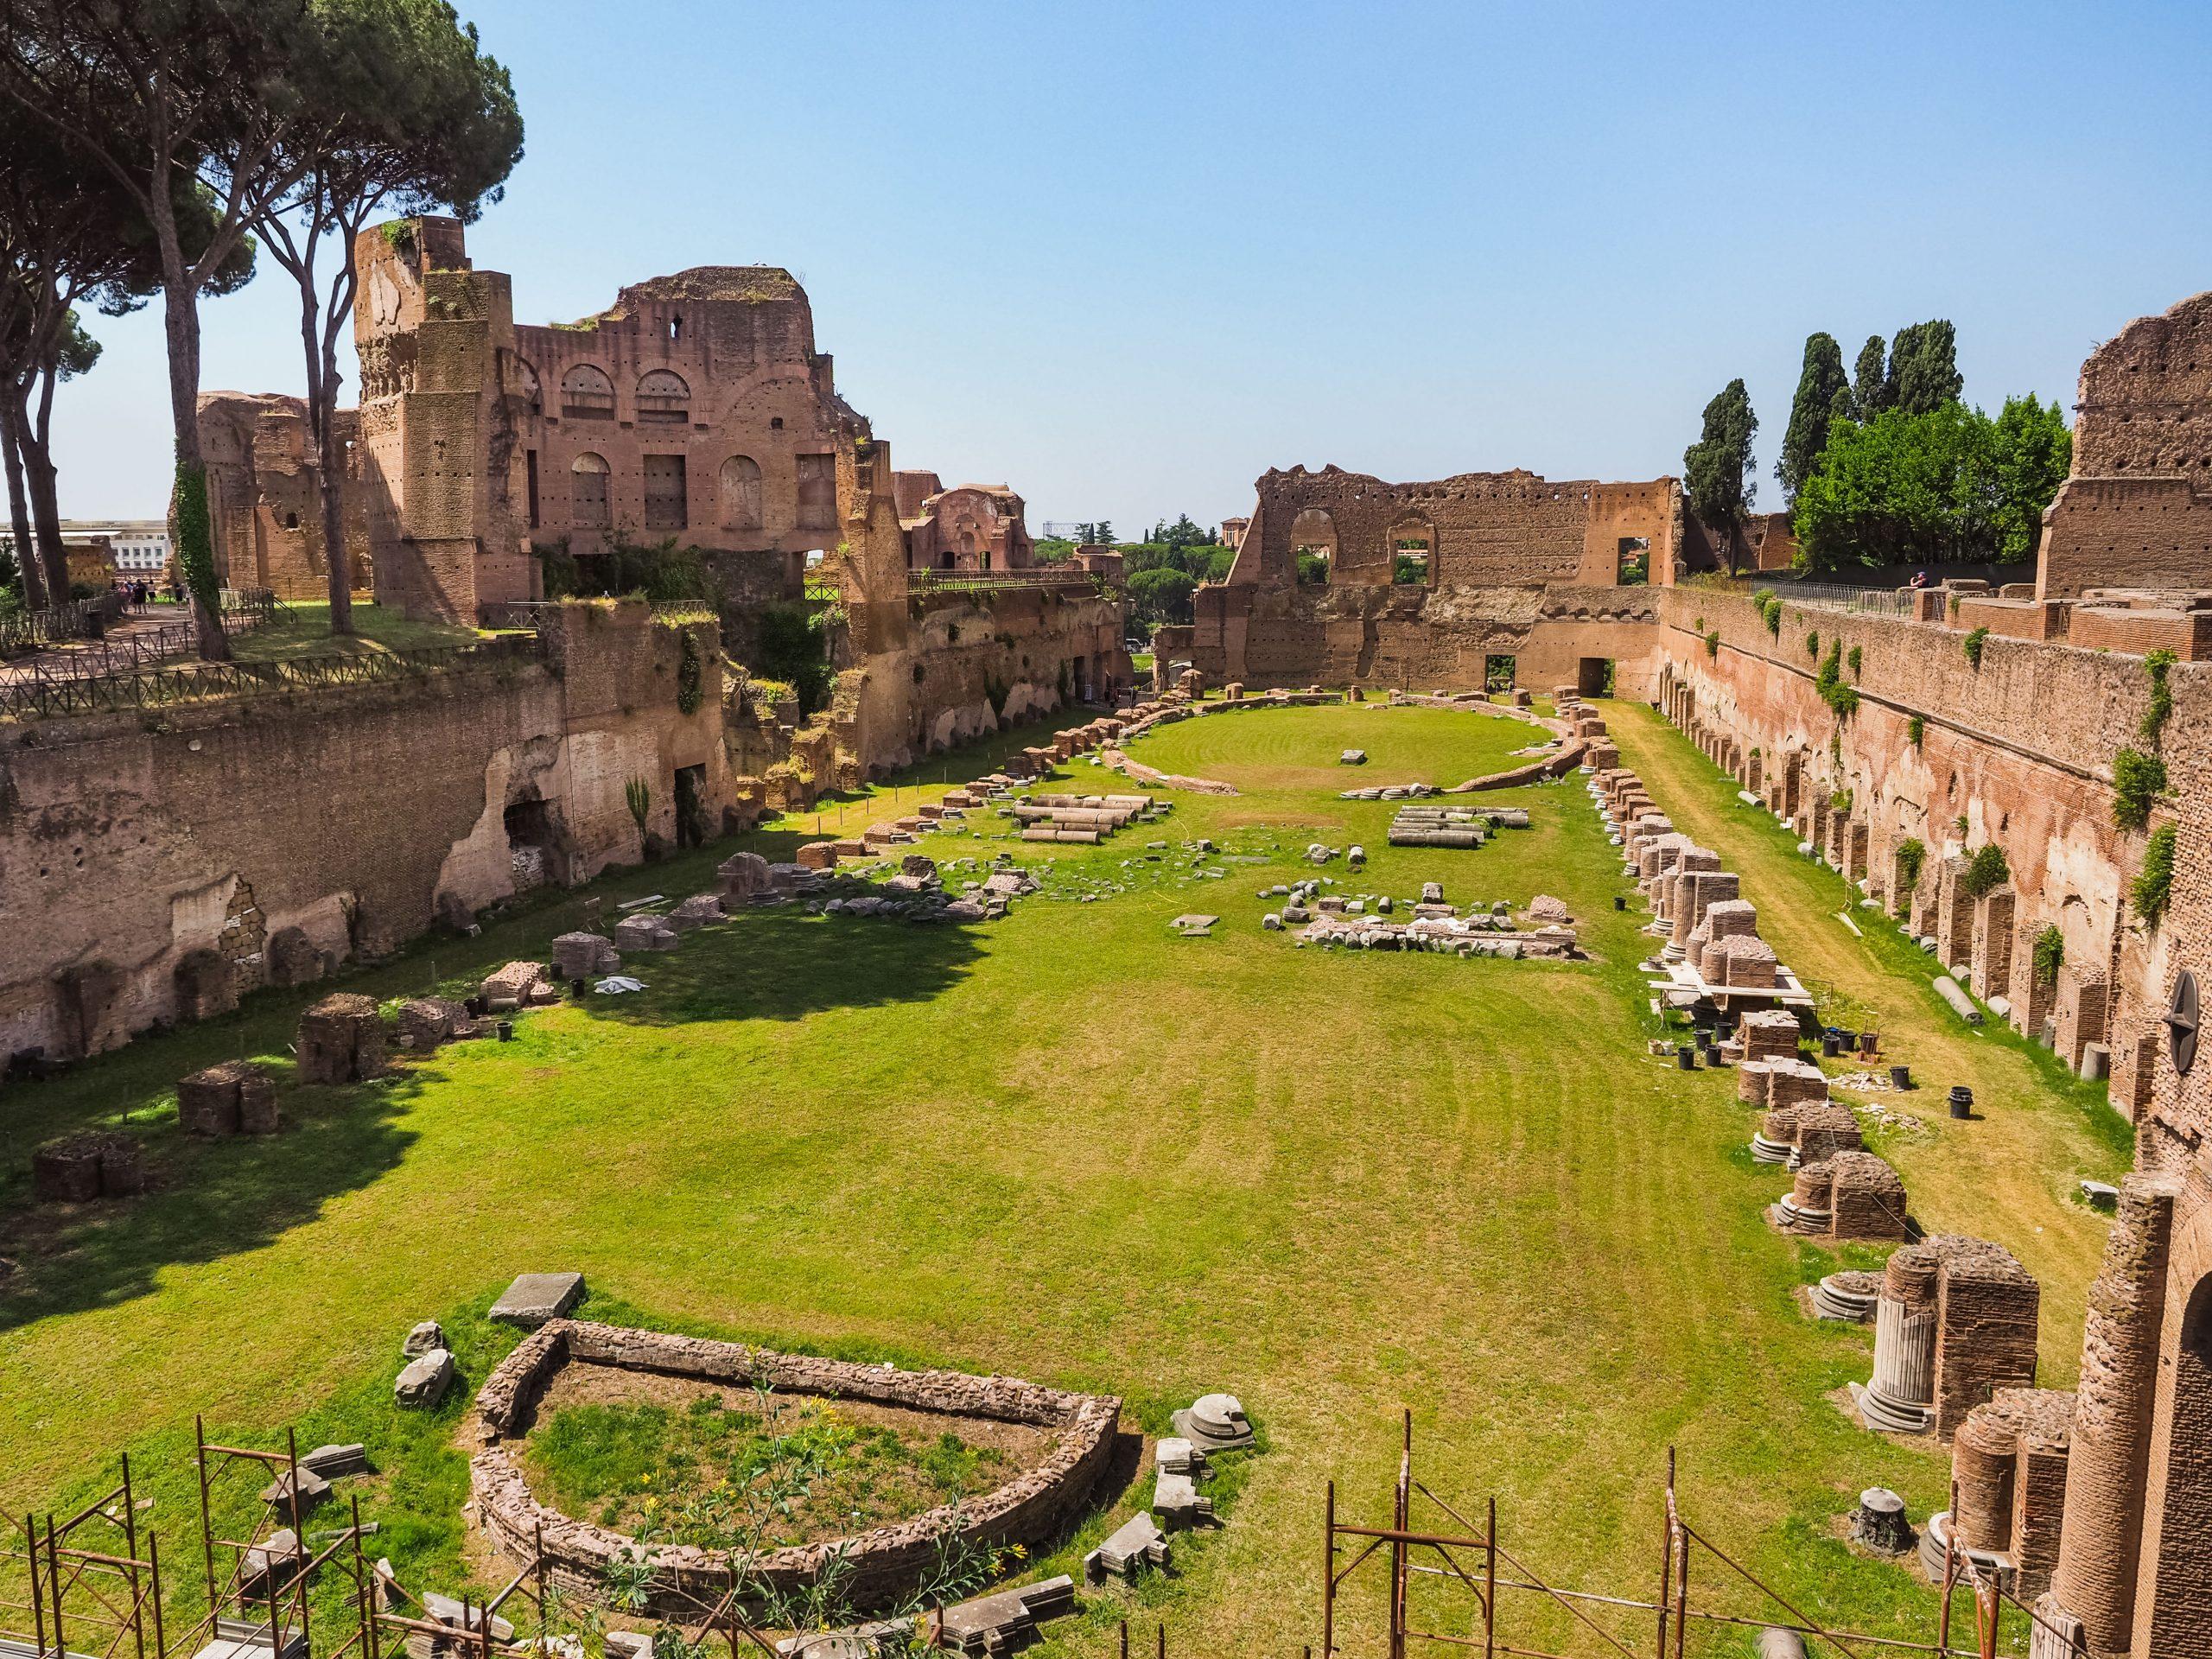 Domitians Stadium_Palatine Hill_Ancient Rome (3)